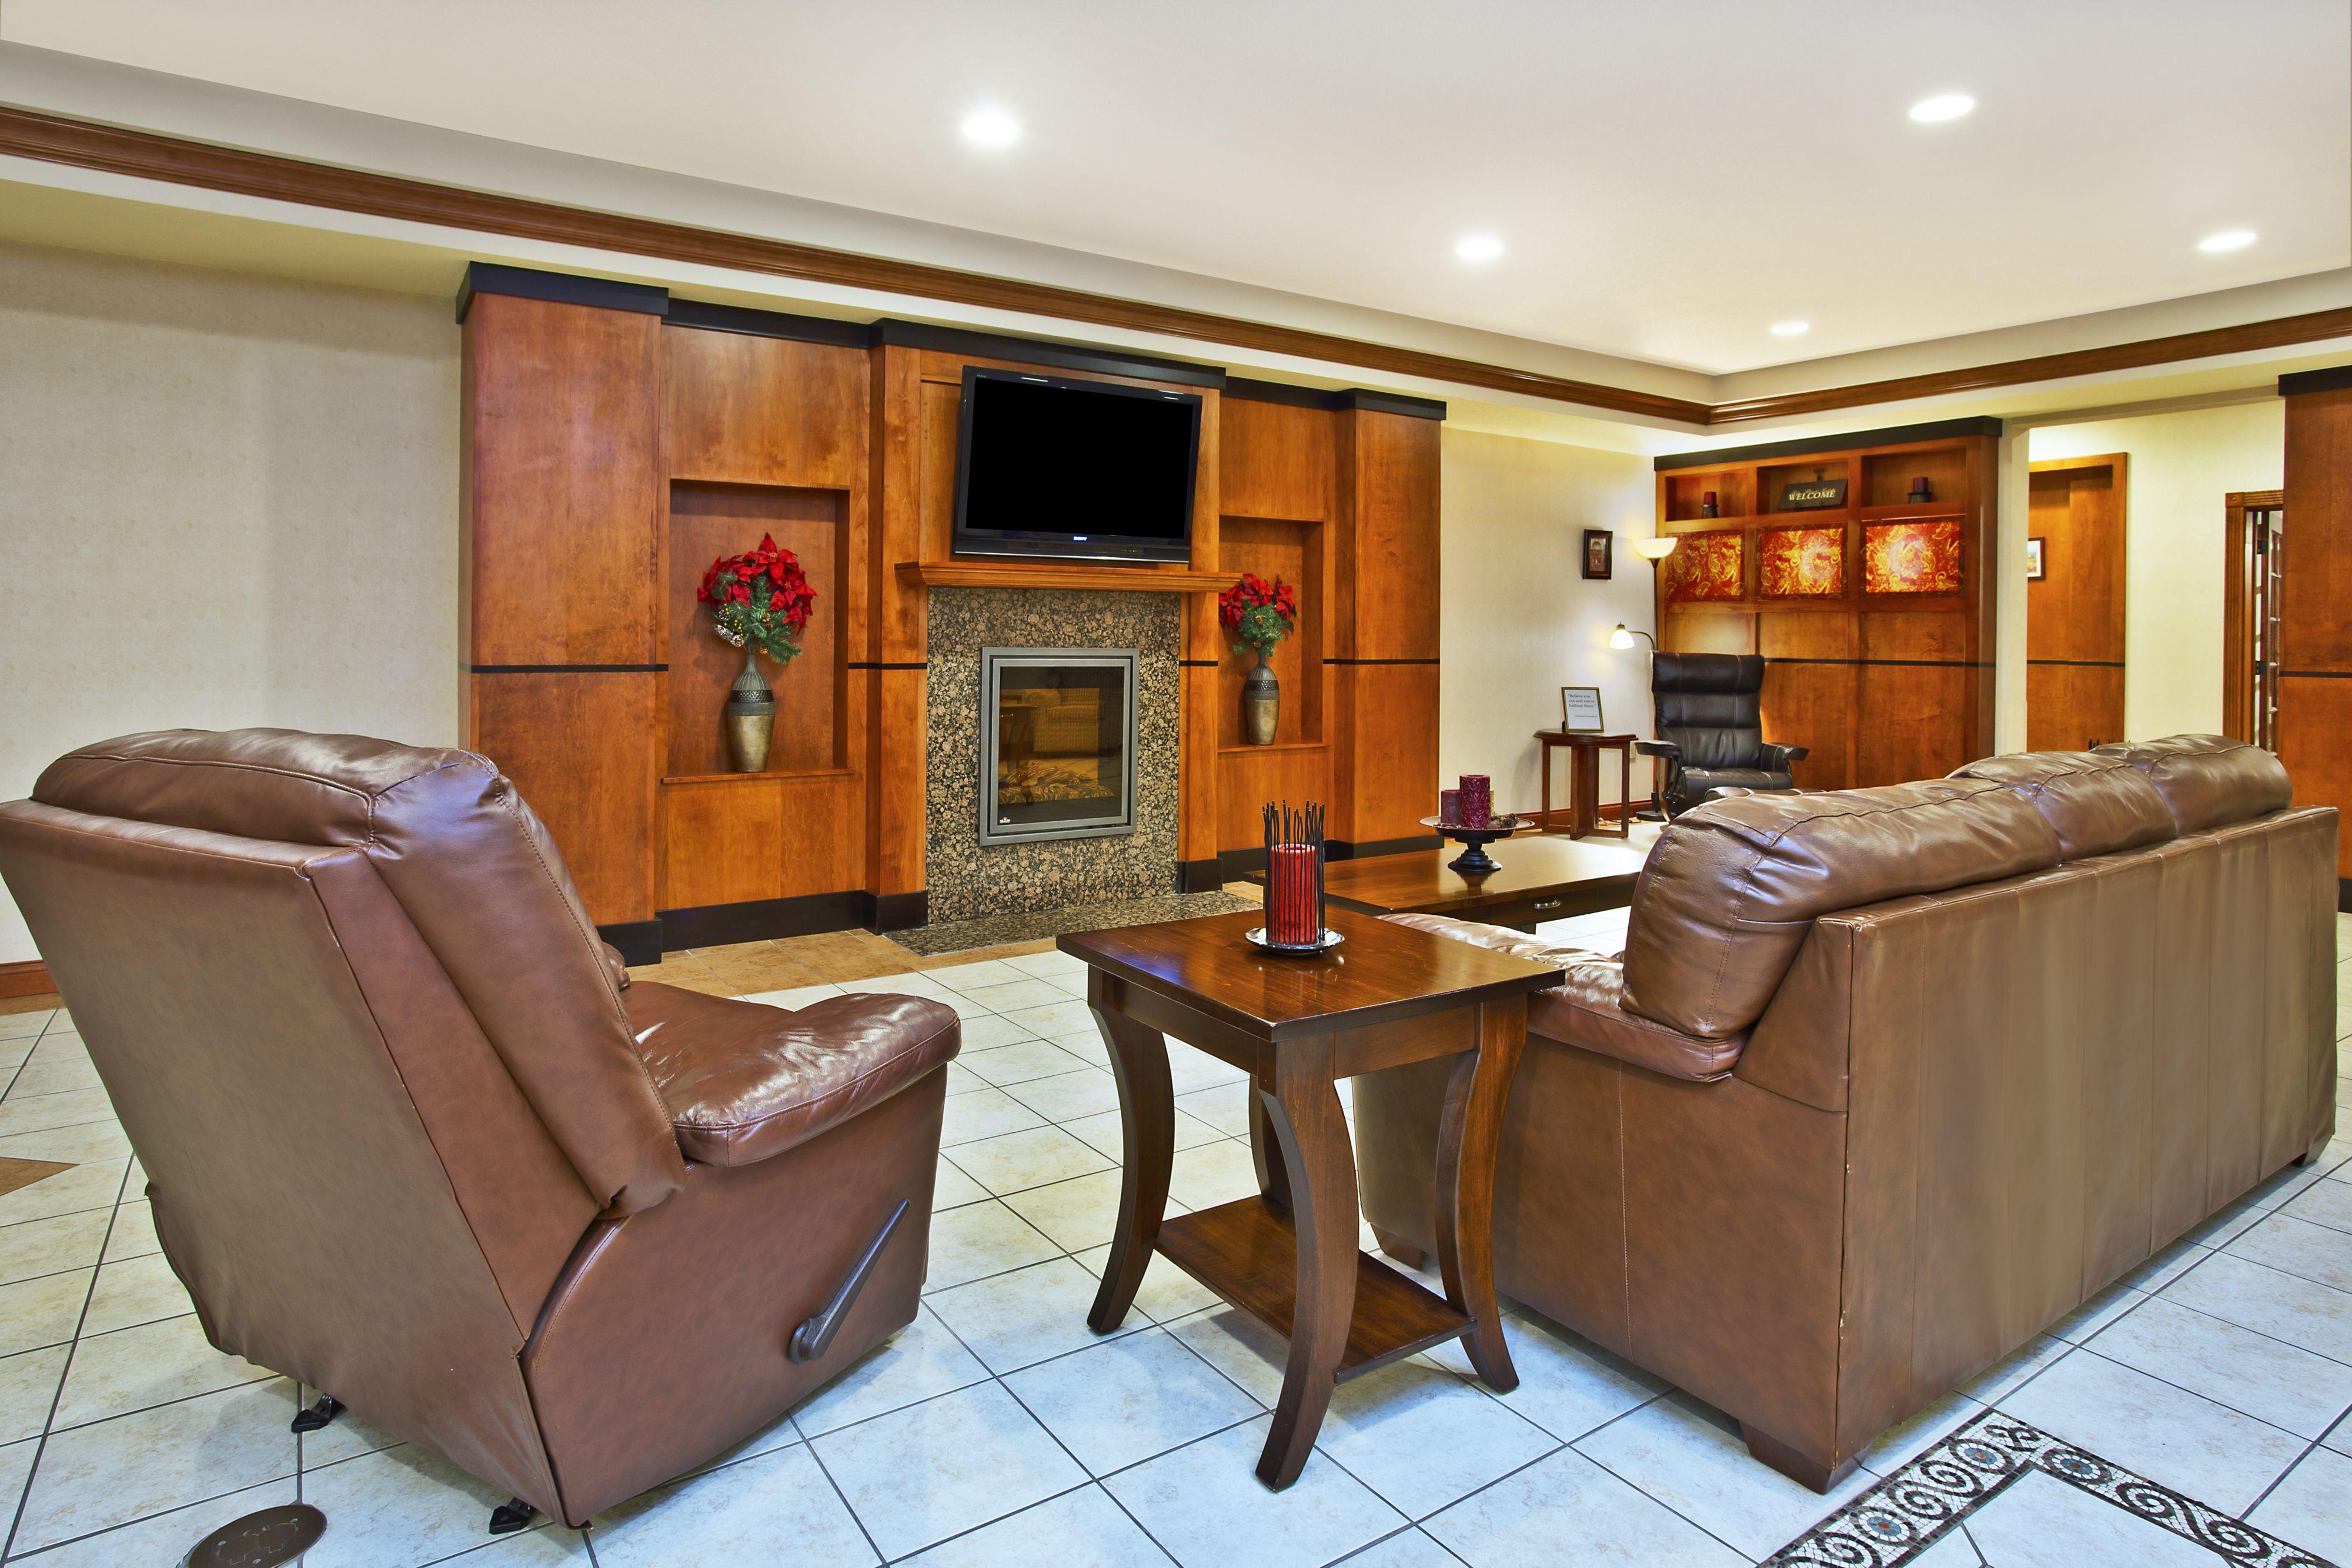 Holiday Inn Express & Suites East Lansing image 5